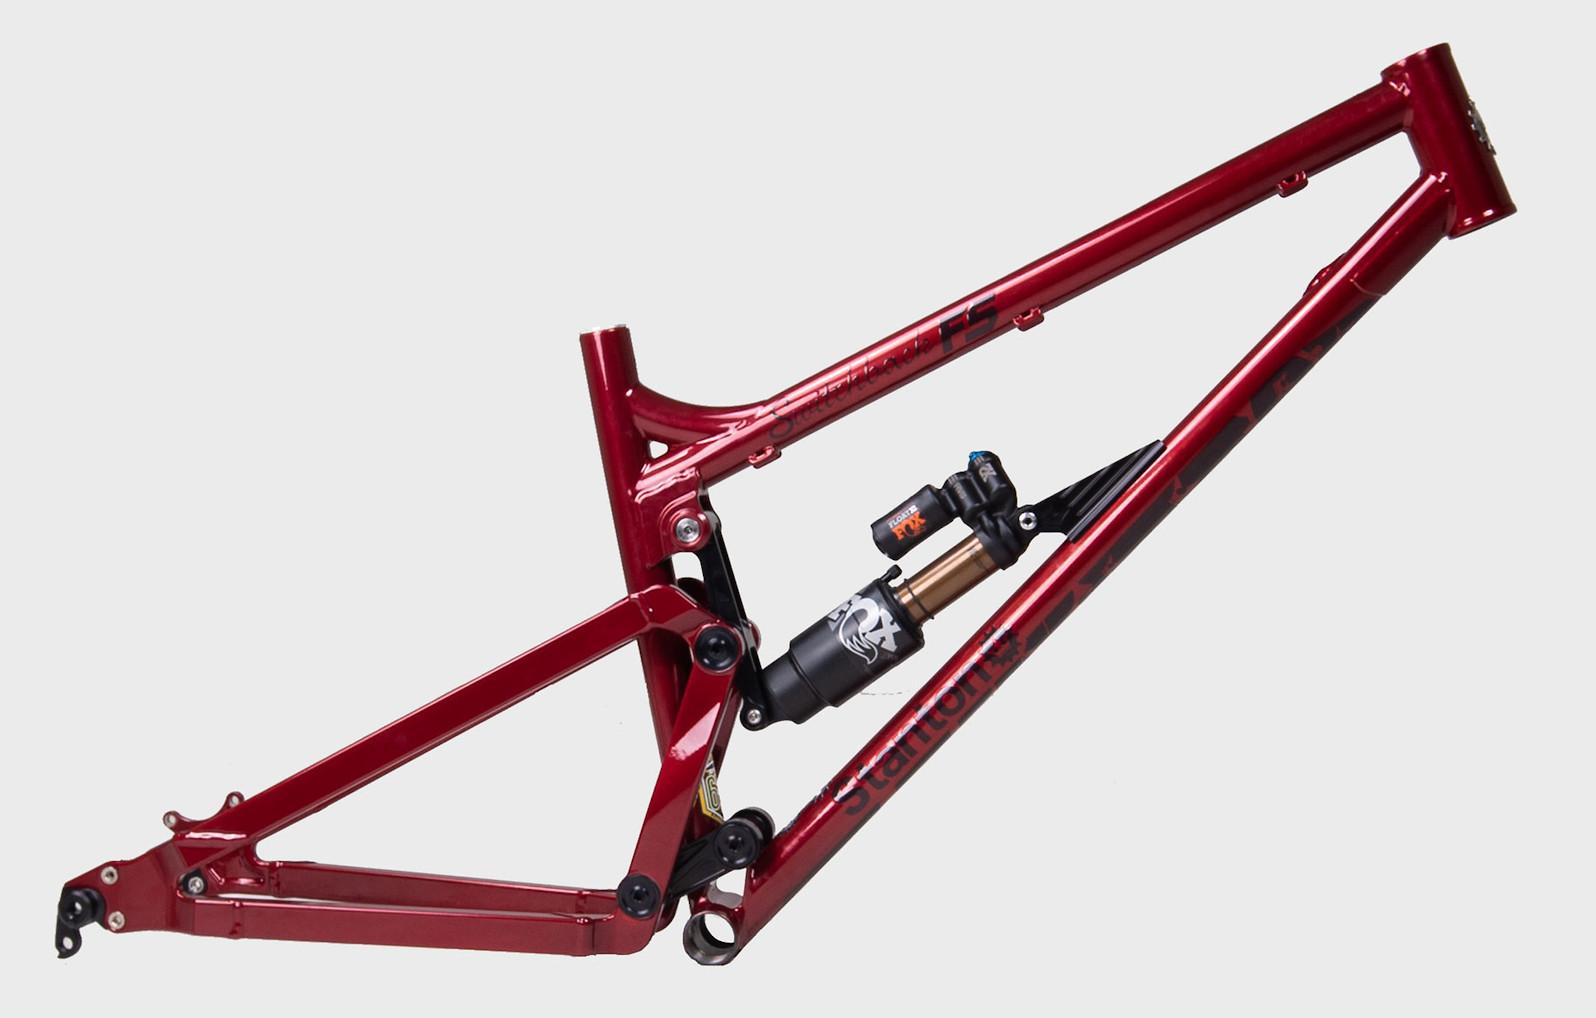 Stanton Switchback FS 140 Frame